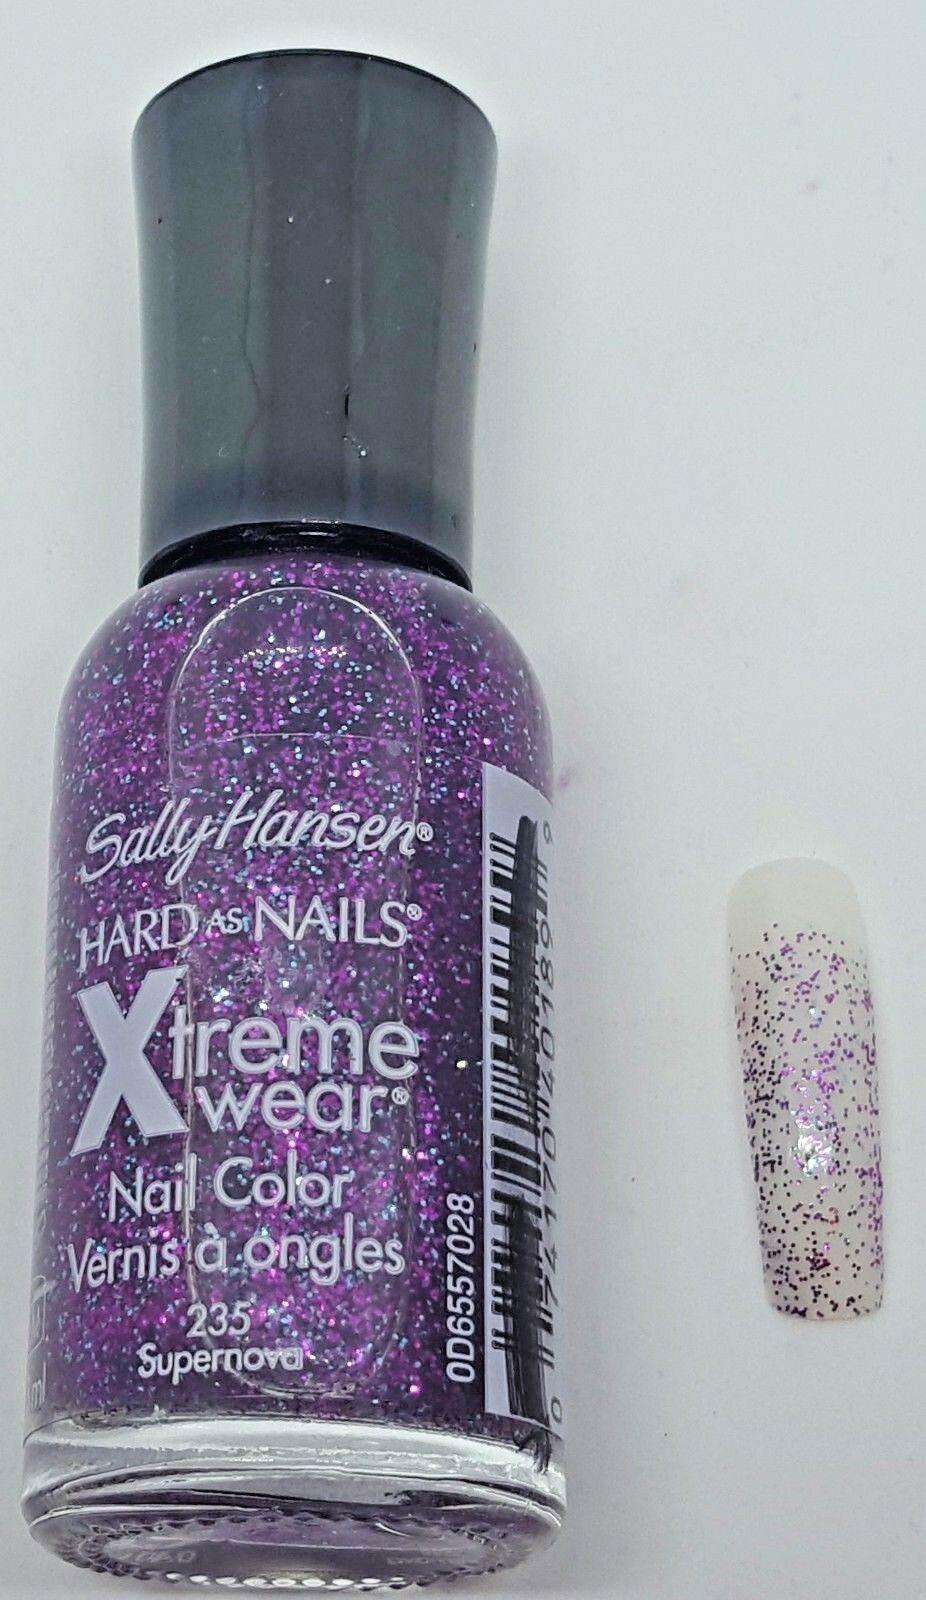 NEW Sally Hansen Hard as Nails Xtreme Wear Nail Polish .45 fl oz 8 Color Choices